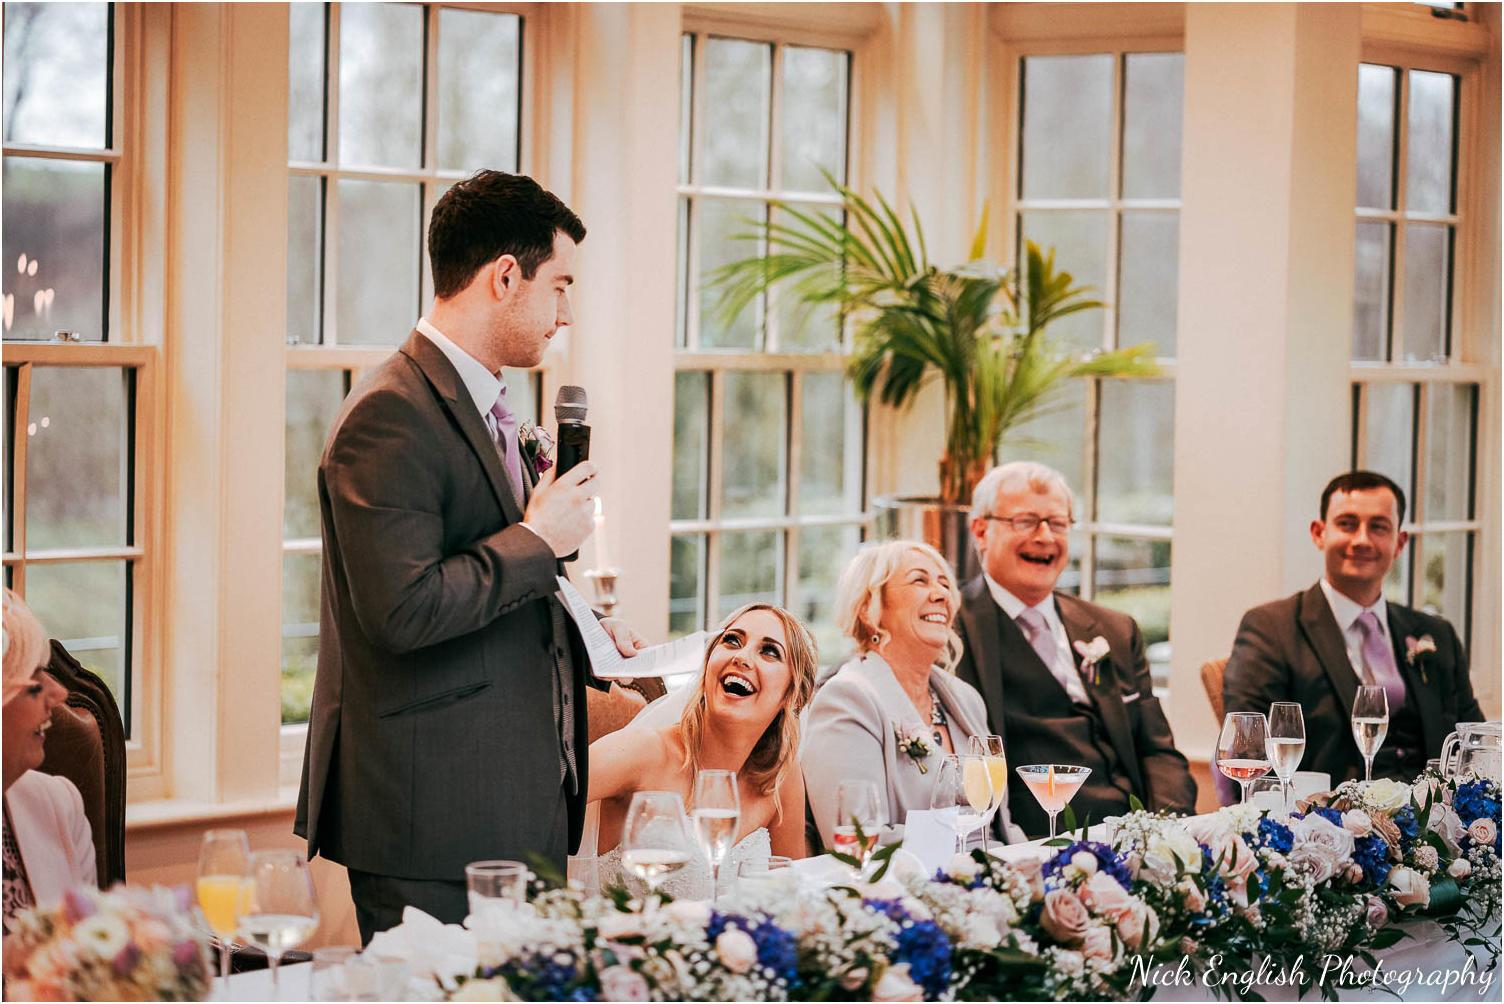 Mitton_Hall_Wedding_Photographer_2018-138.jpg